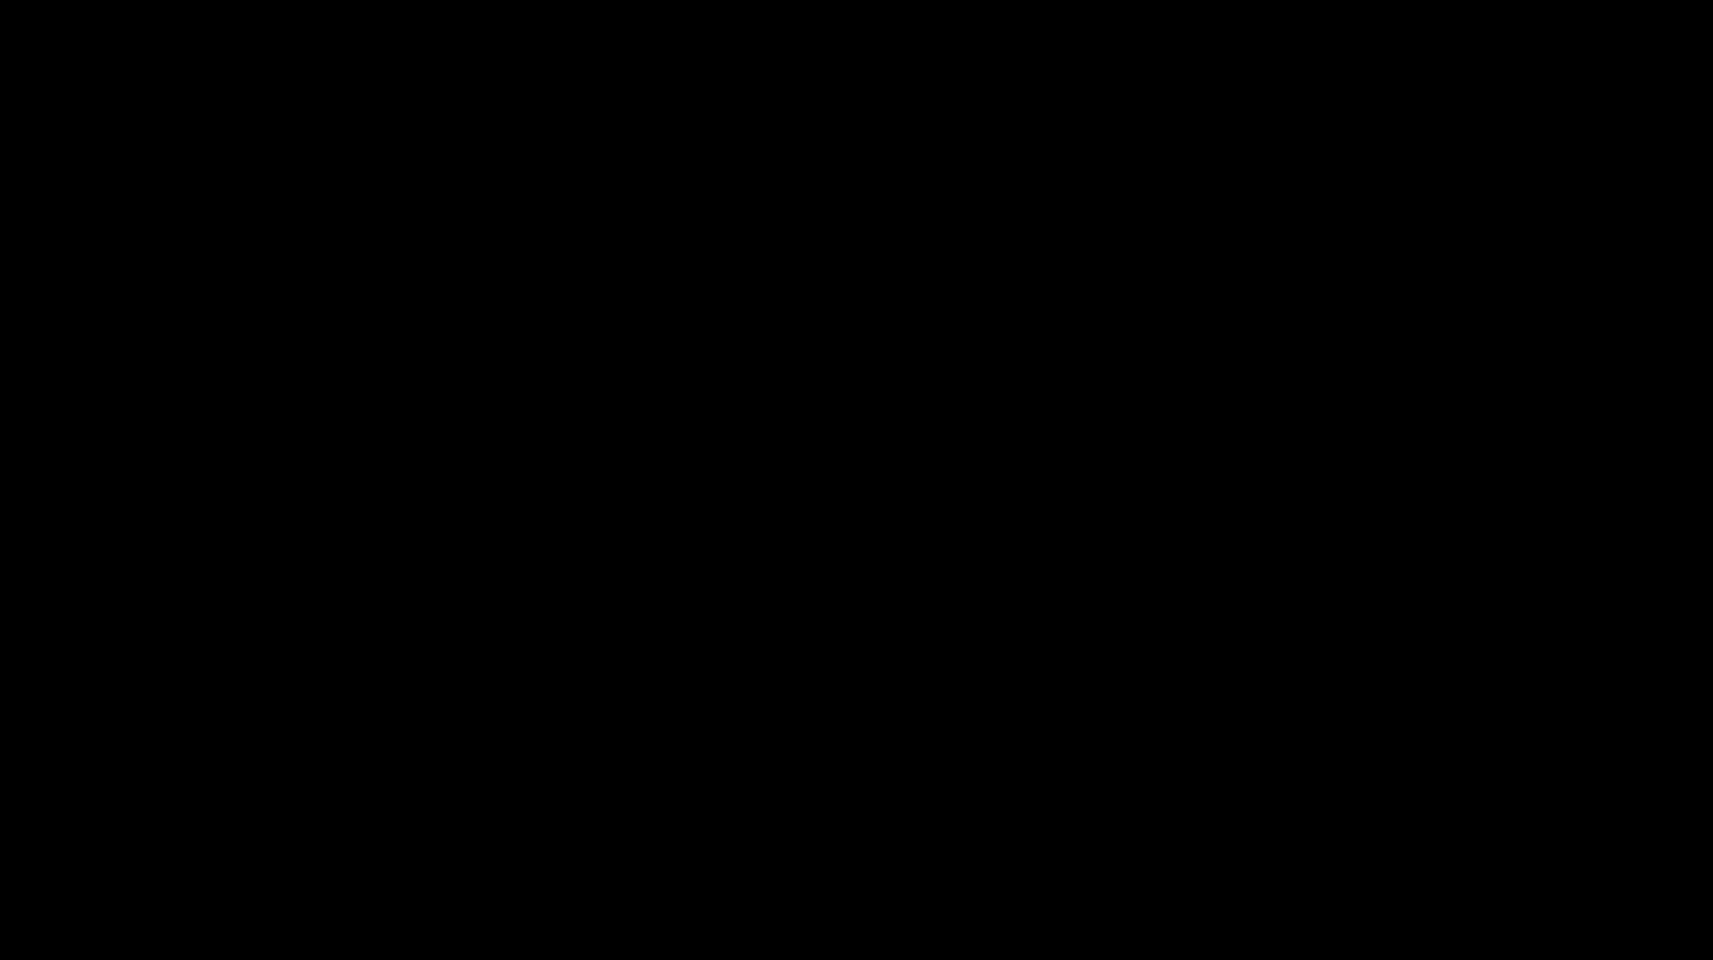 large_gradient-05.png